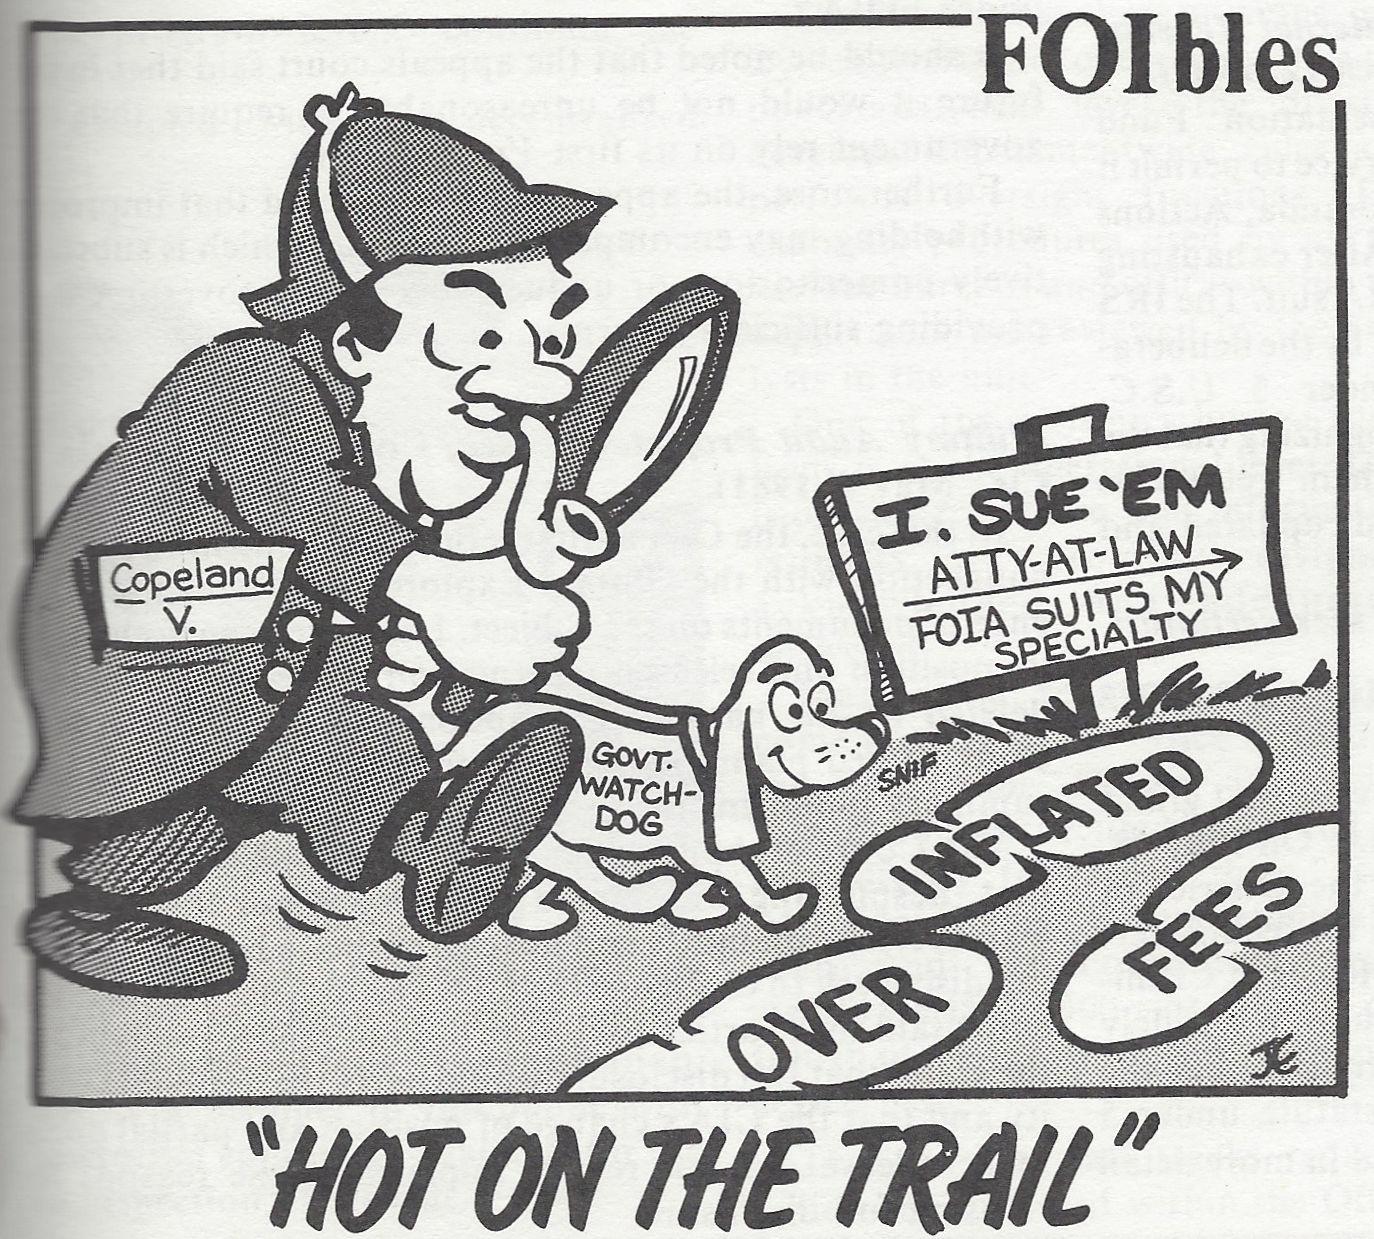 Vol II, No 3, June 1981. Artist: JE [presumably Jon Enten]